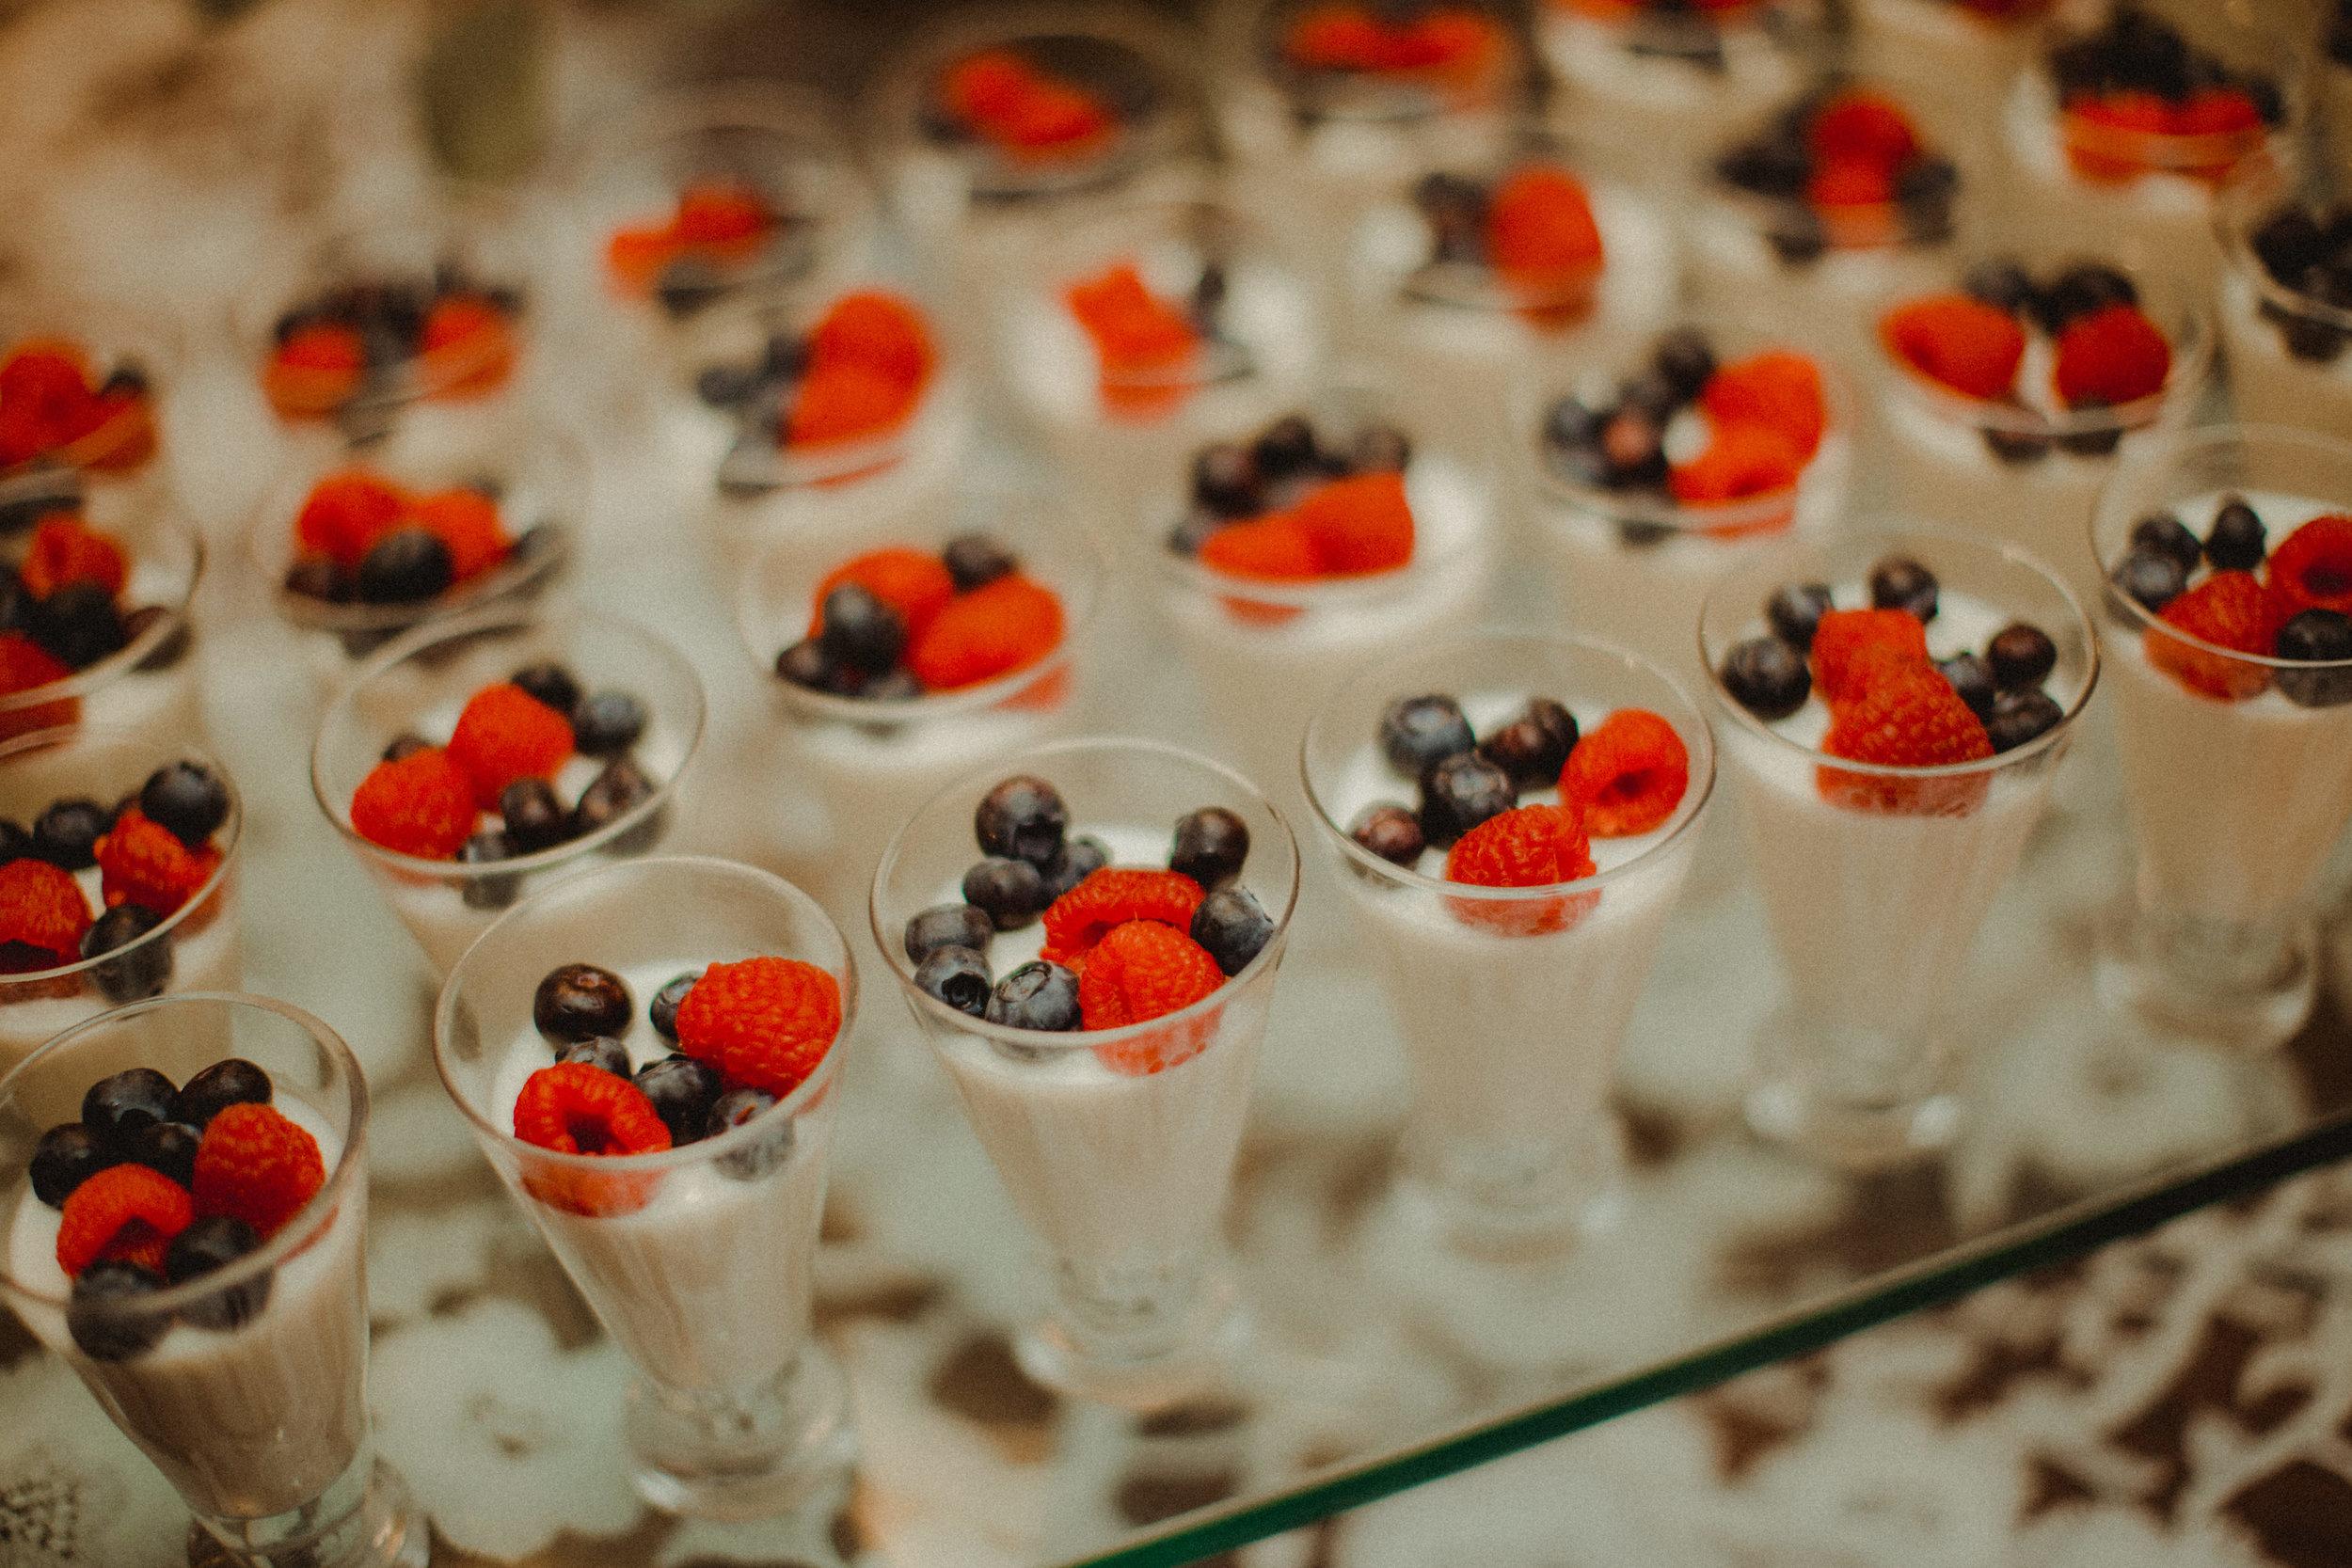 Raspberry & Blueberry sweet treat